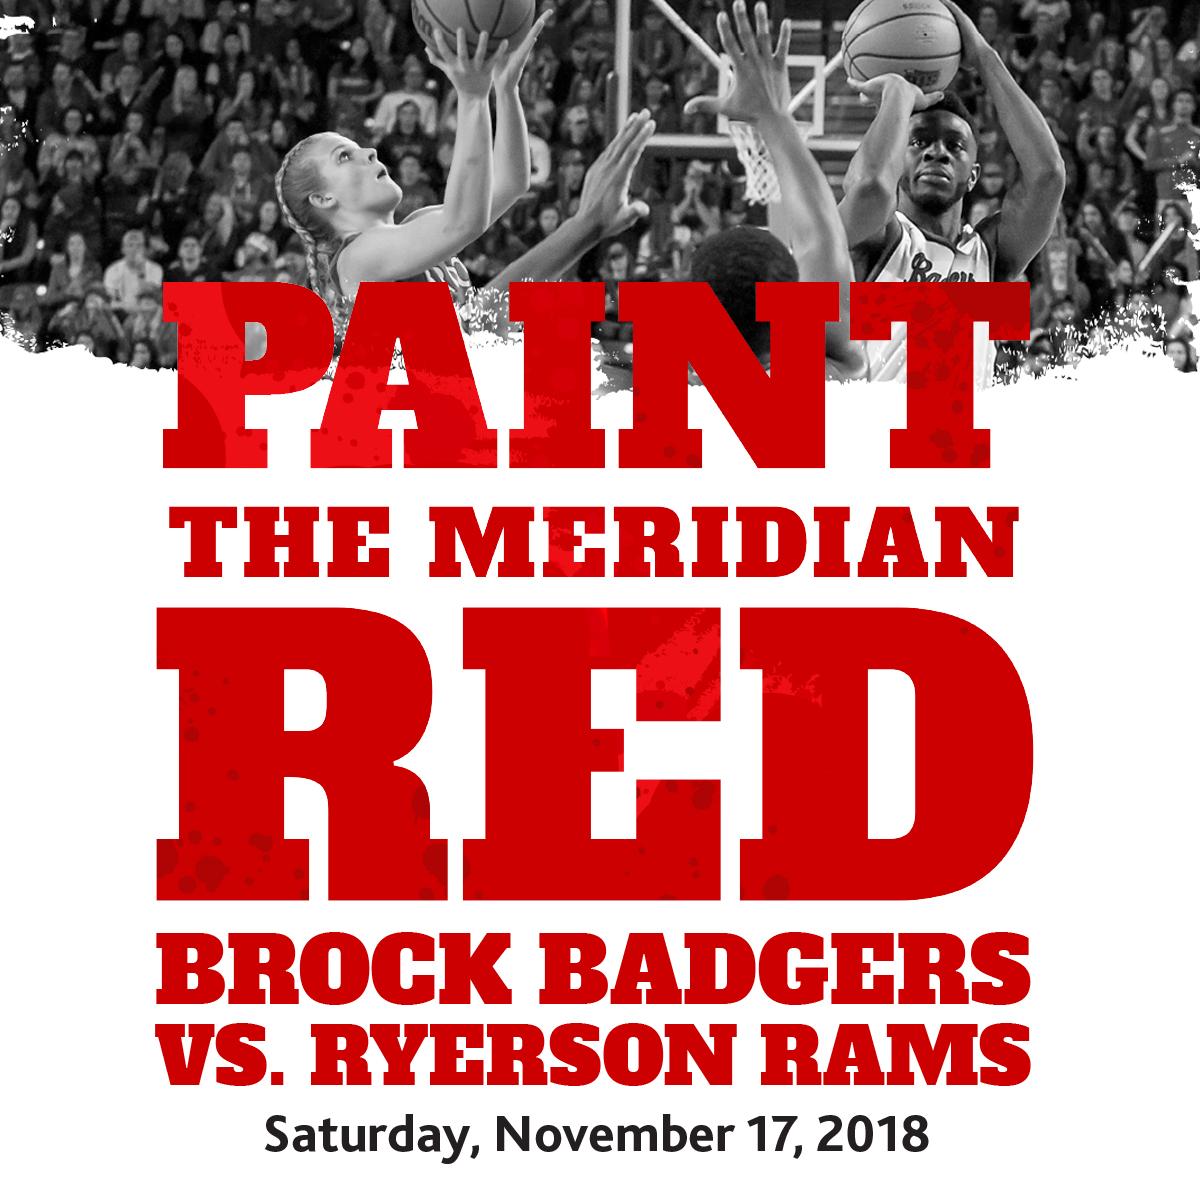 Brock Badgers – Paint The Meridian Red